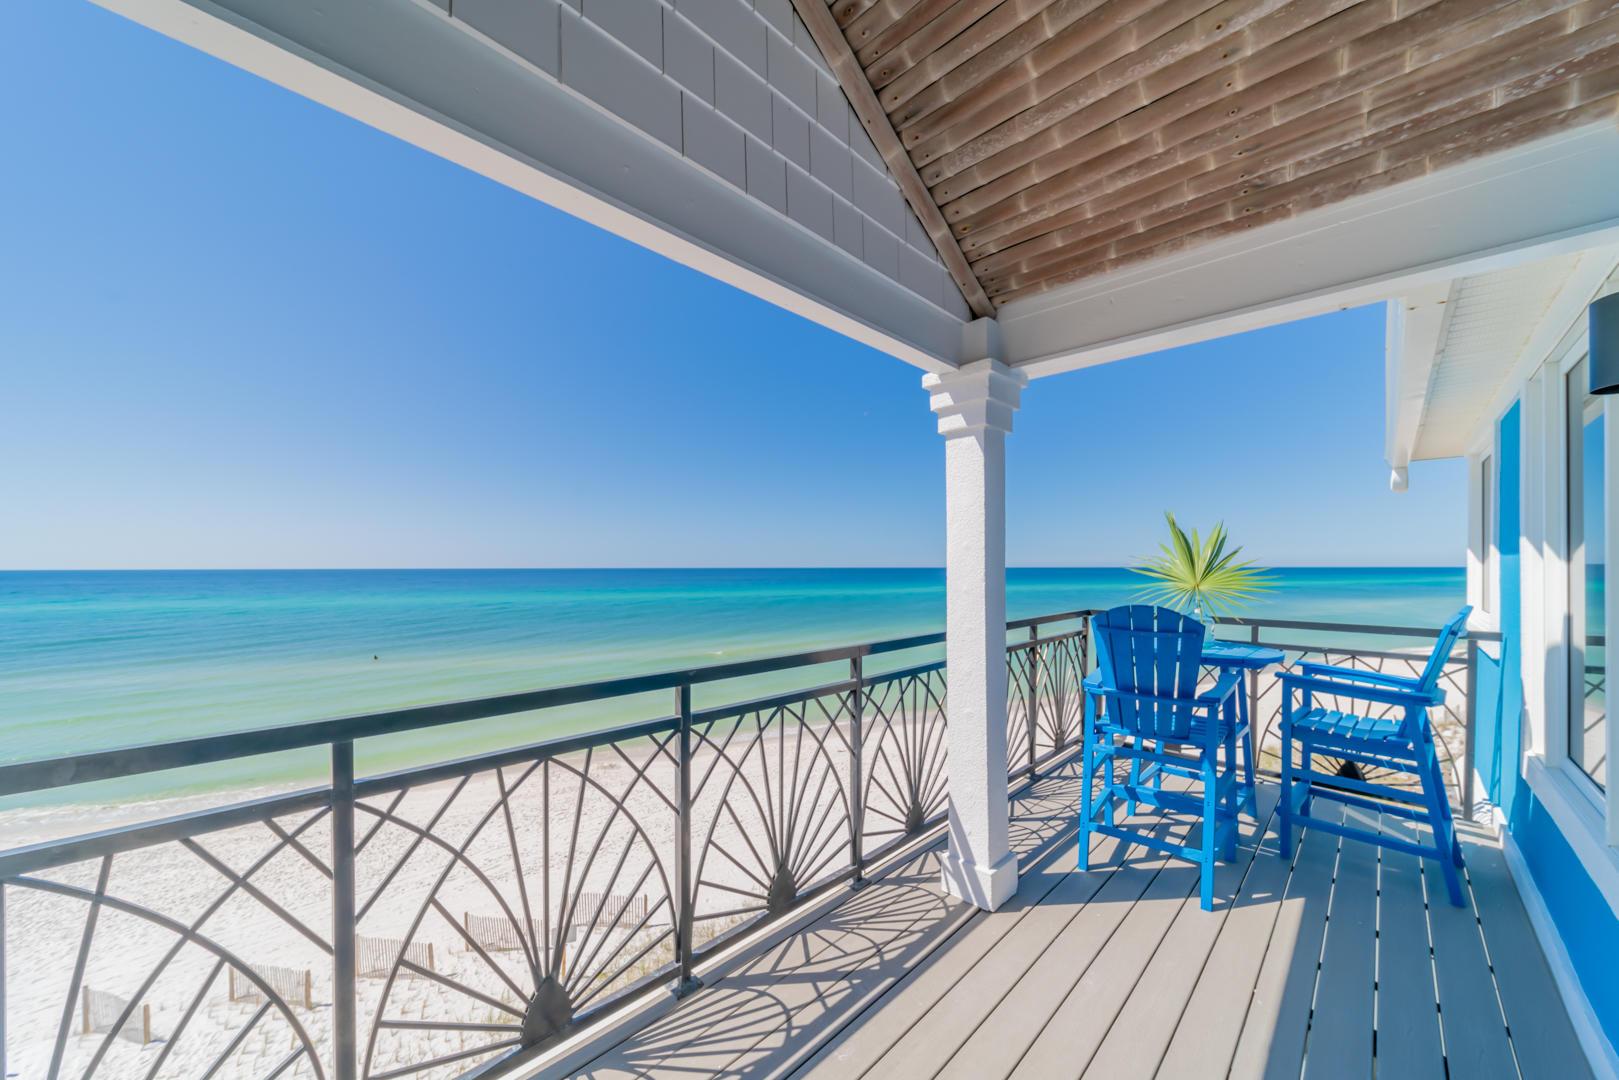 260 Wall St, Inlet Beach, FL, 32461